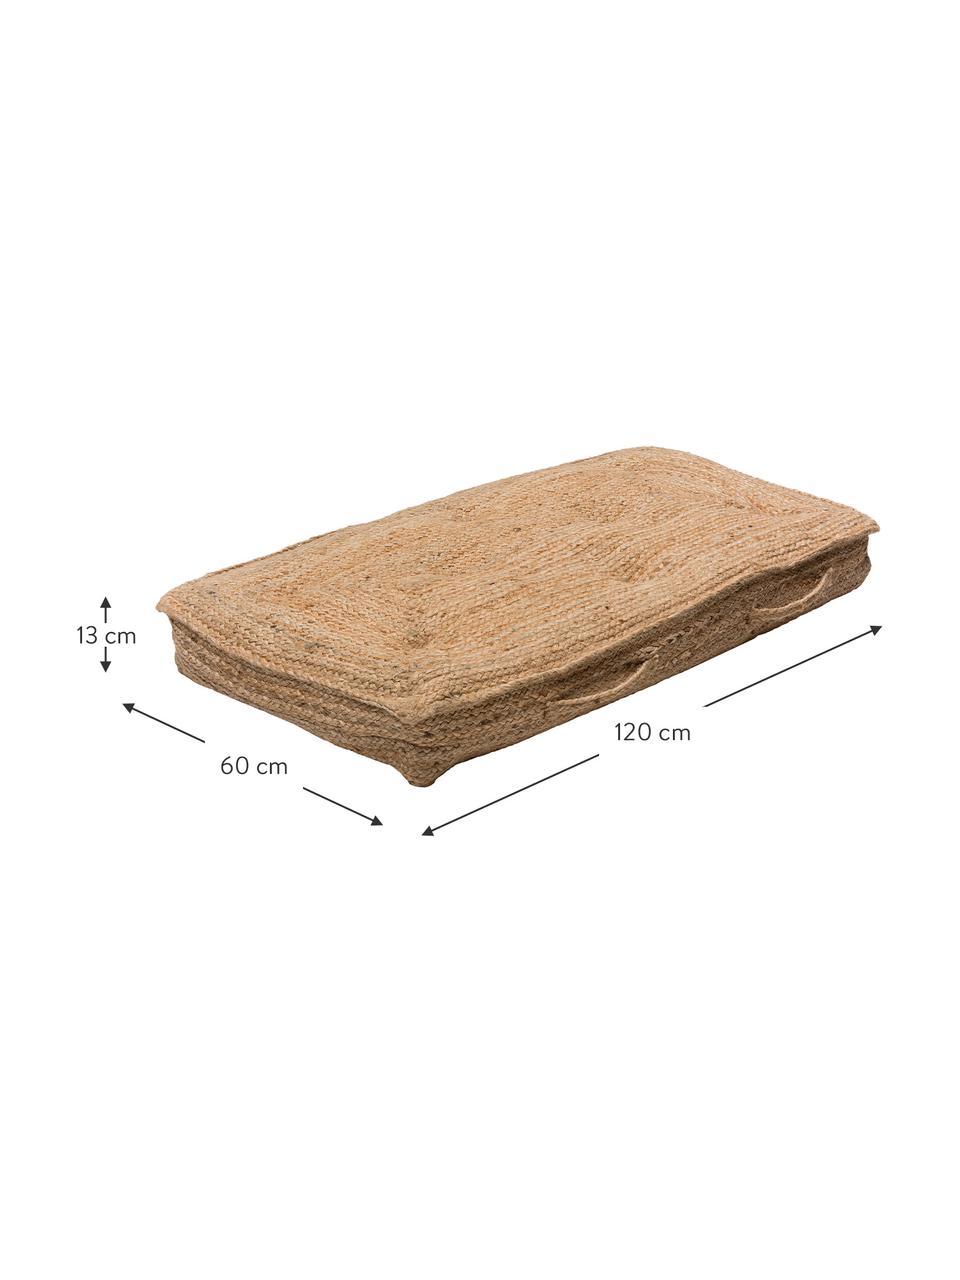 Cuscino da pavimento in juta Ural, Beige, Larg. 60 x Lung. 120 cm